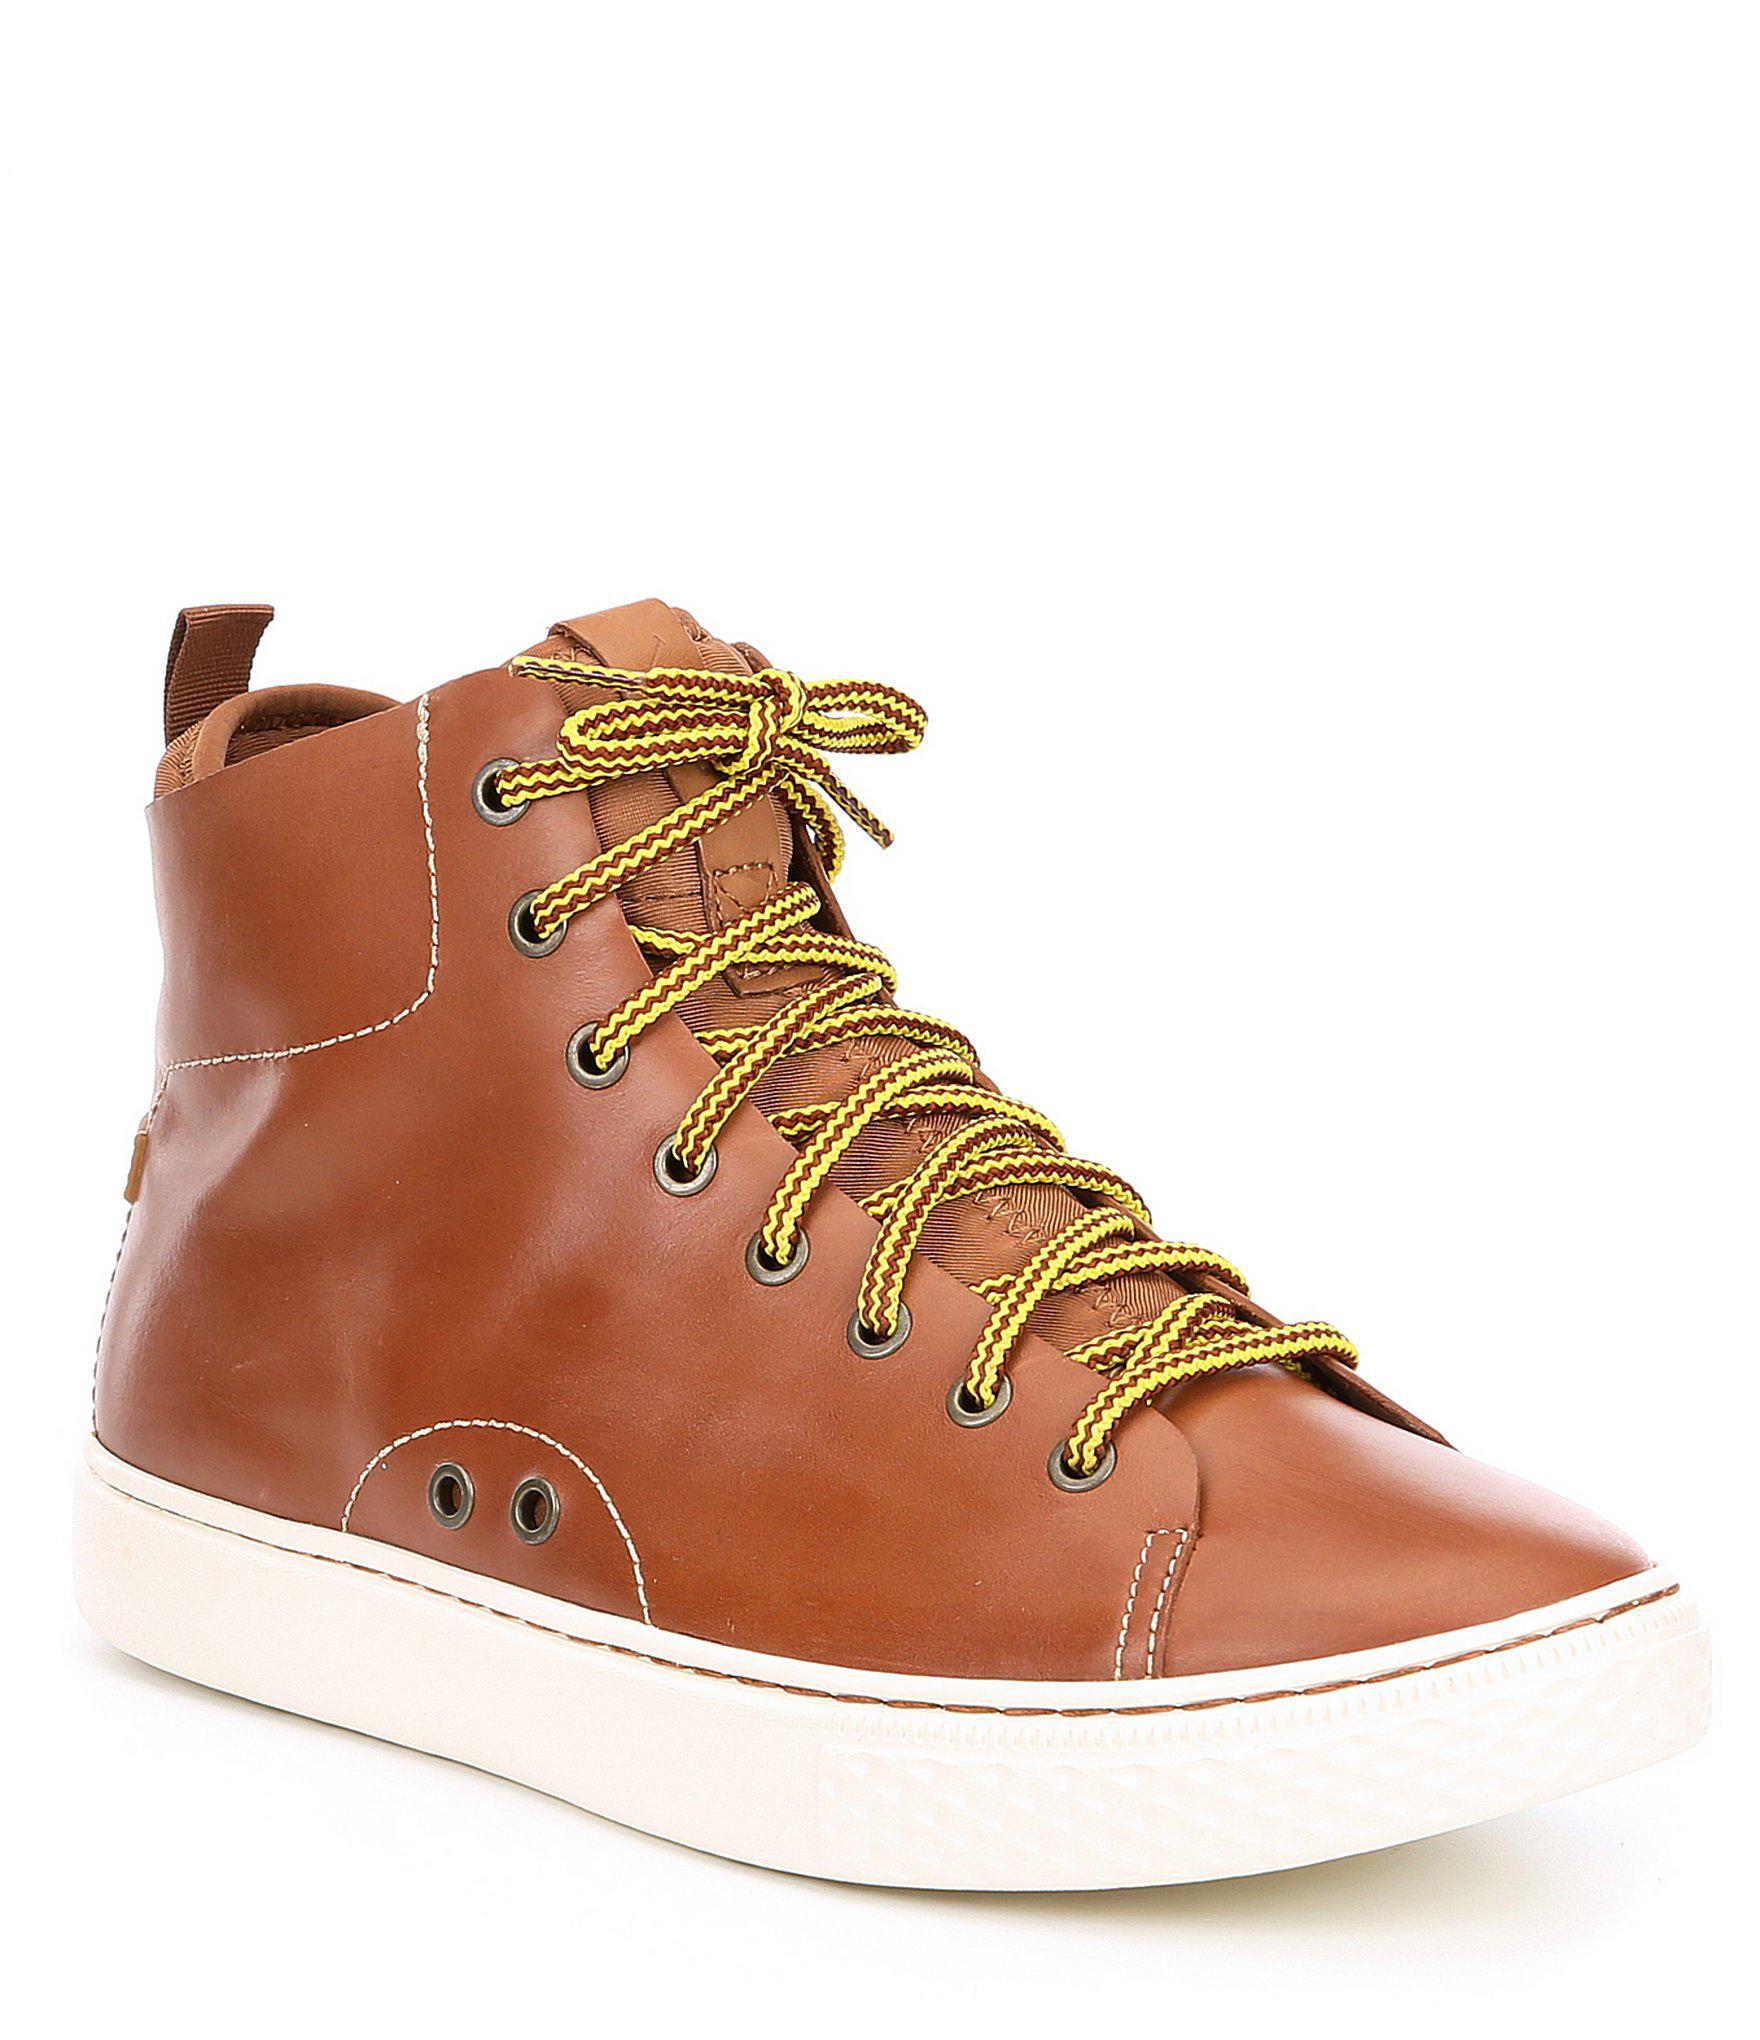 240ed9620fb9 Lyst - Polo Ralph Lauren Men s Leather Delaney Hi Top Sneaker in ...